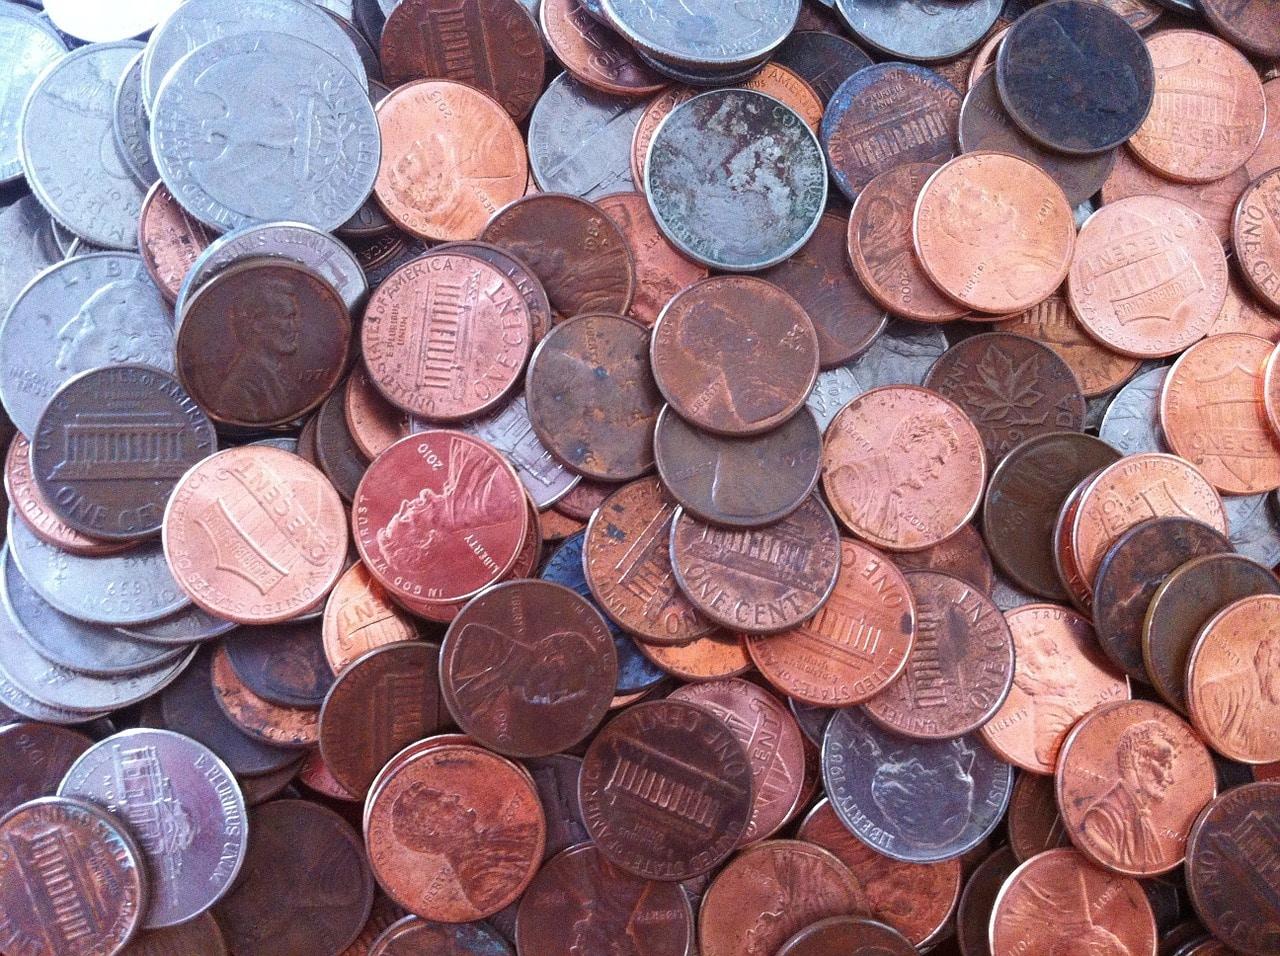 Hombre tira 80 mil centavos como último pago de manutención